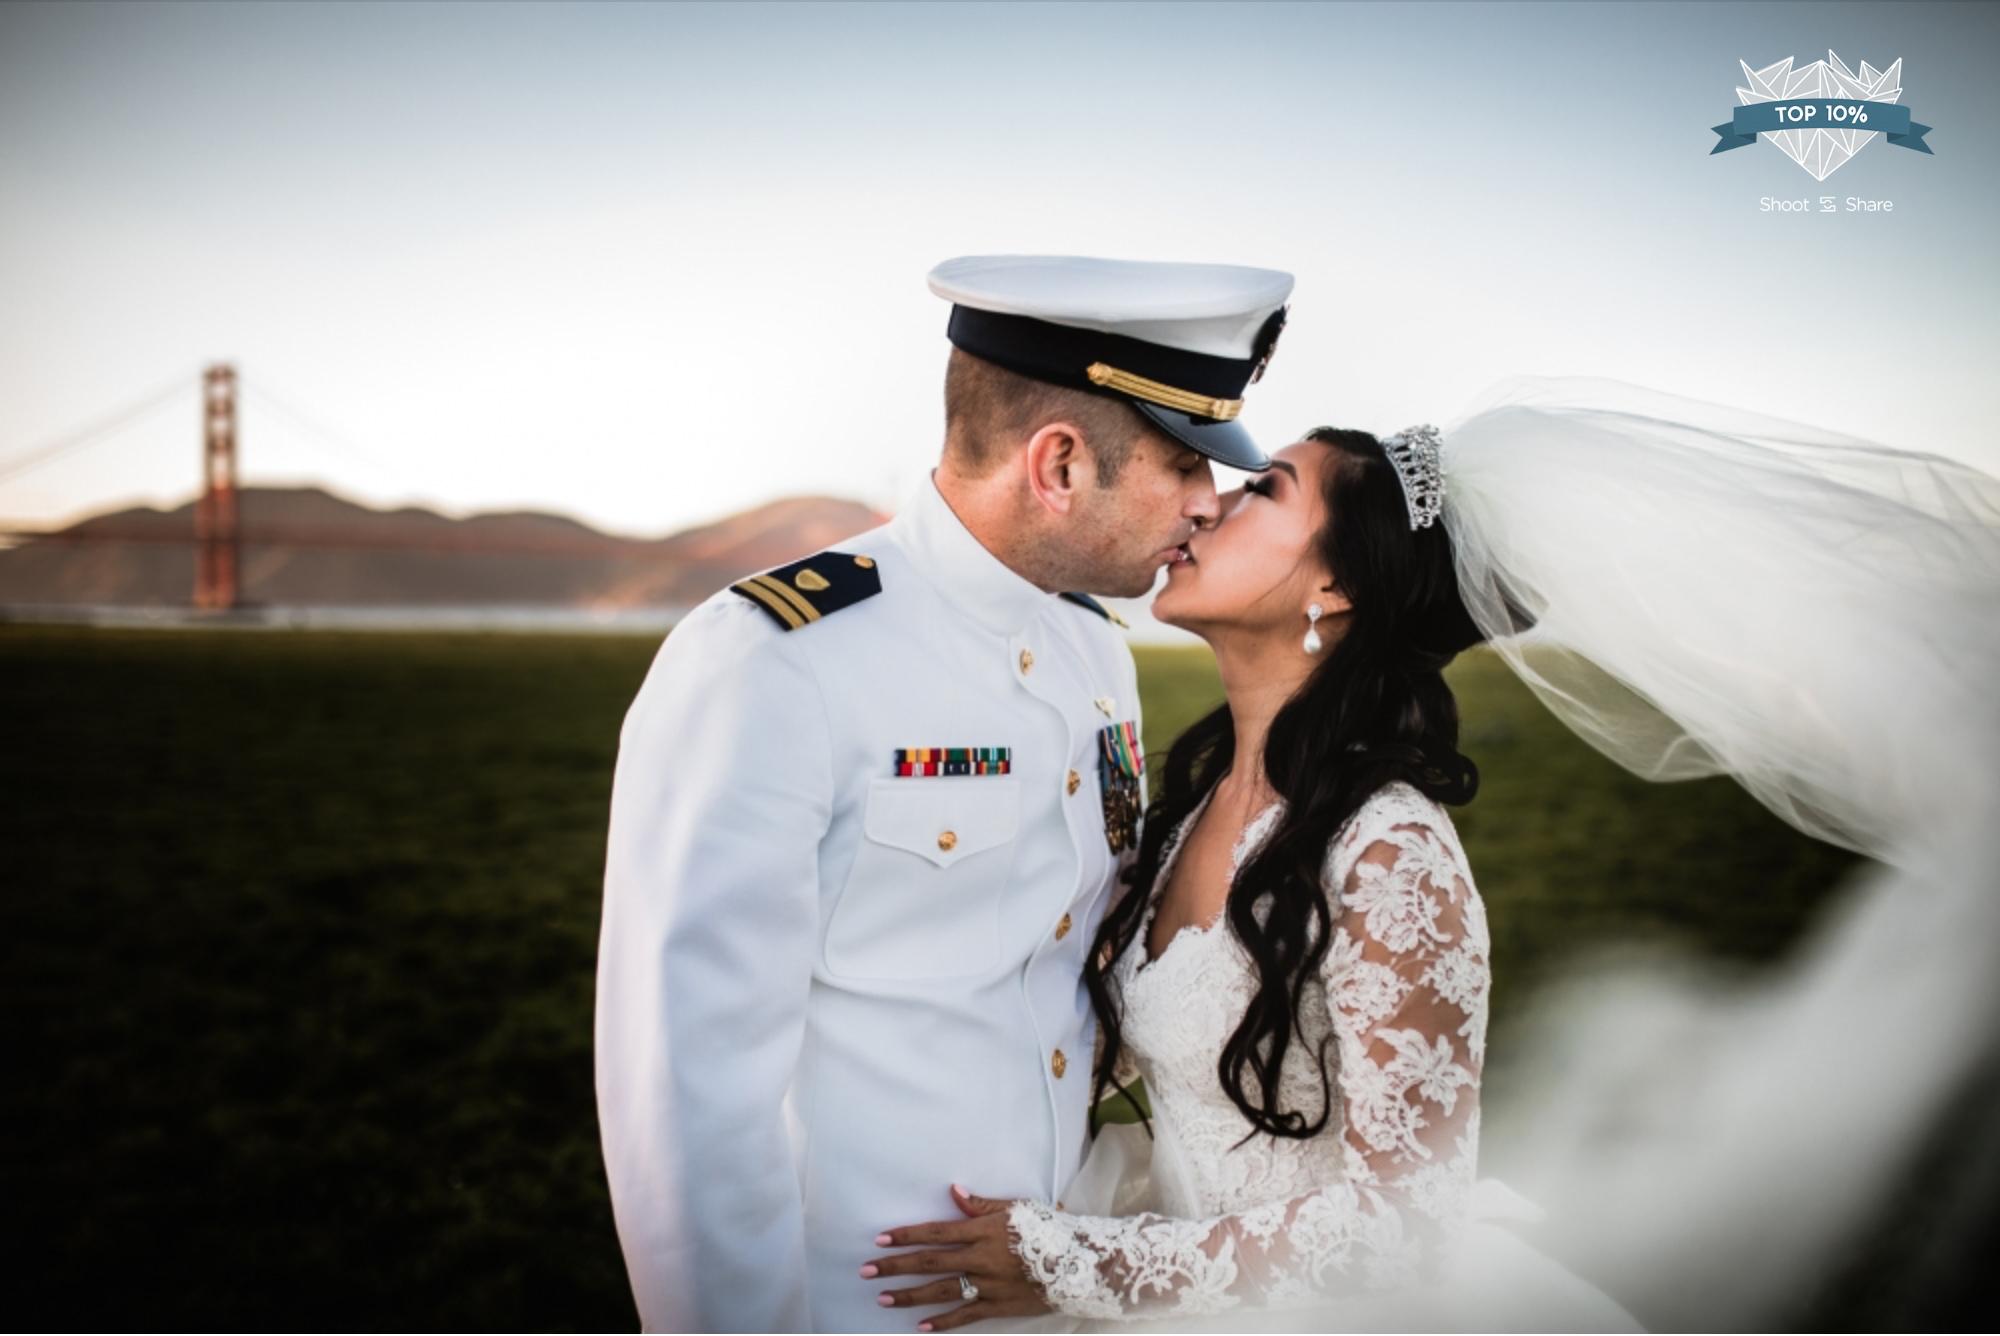 Category: Wedding Couple | Place: 715/36,983